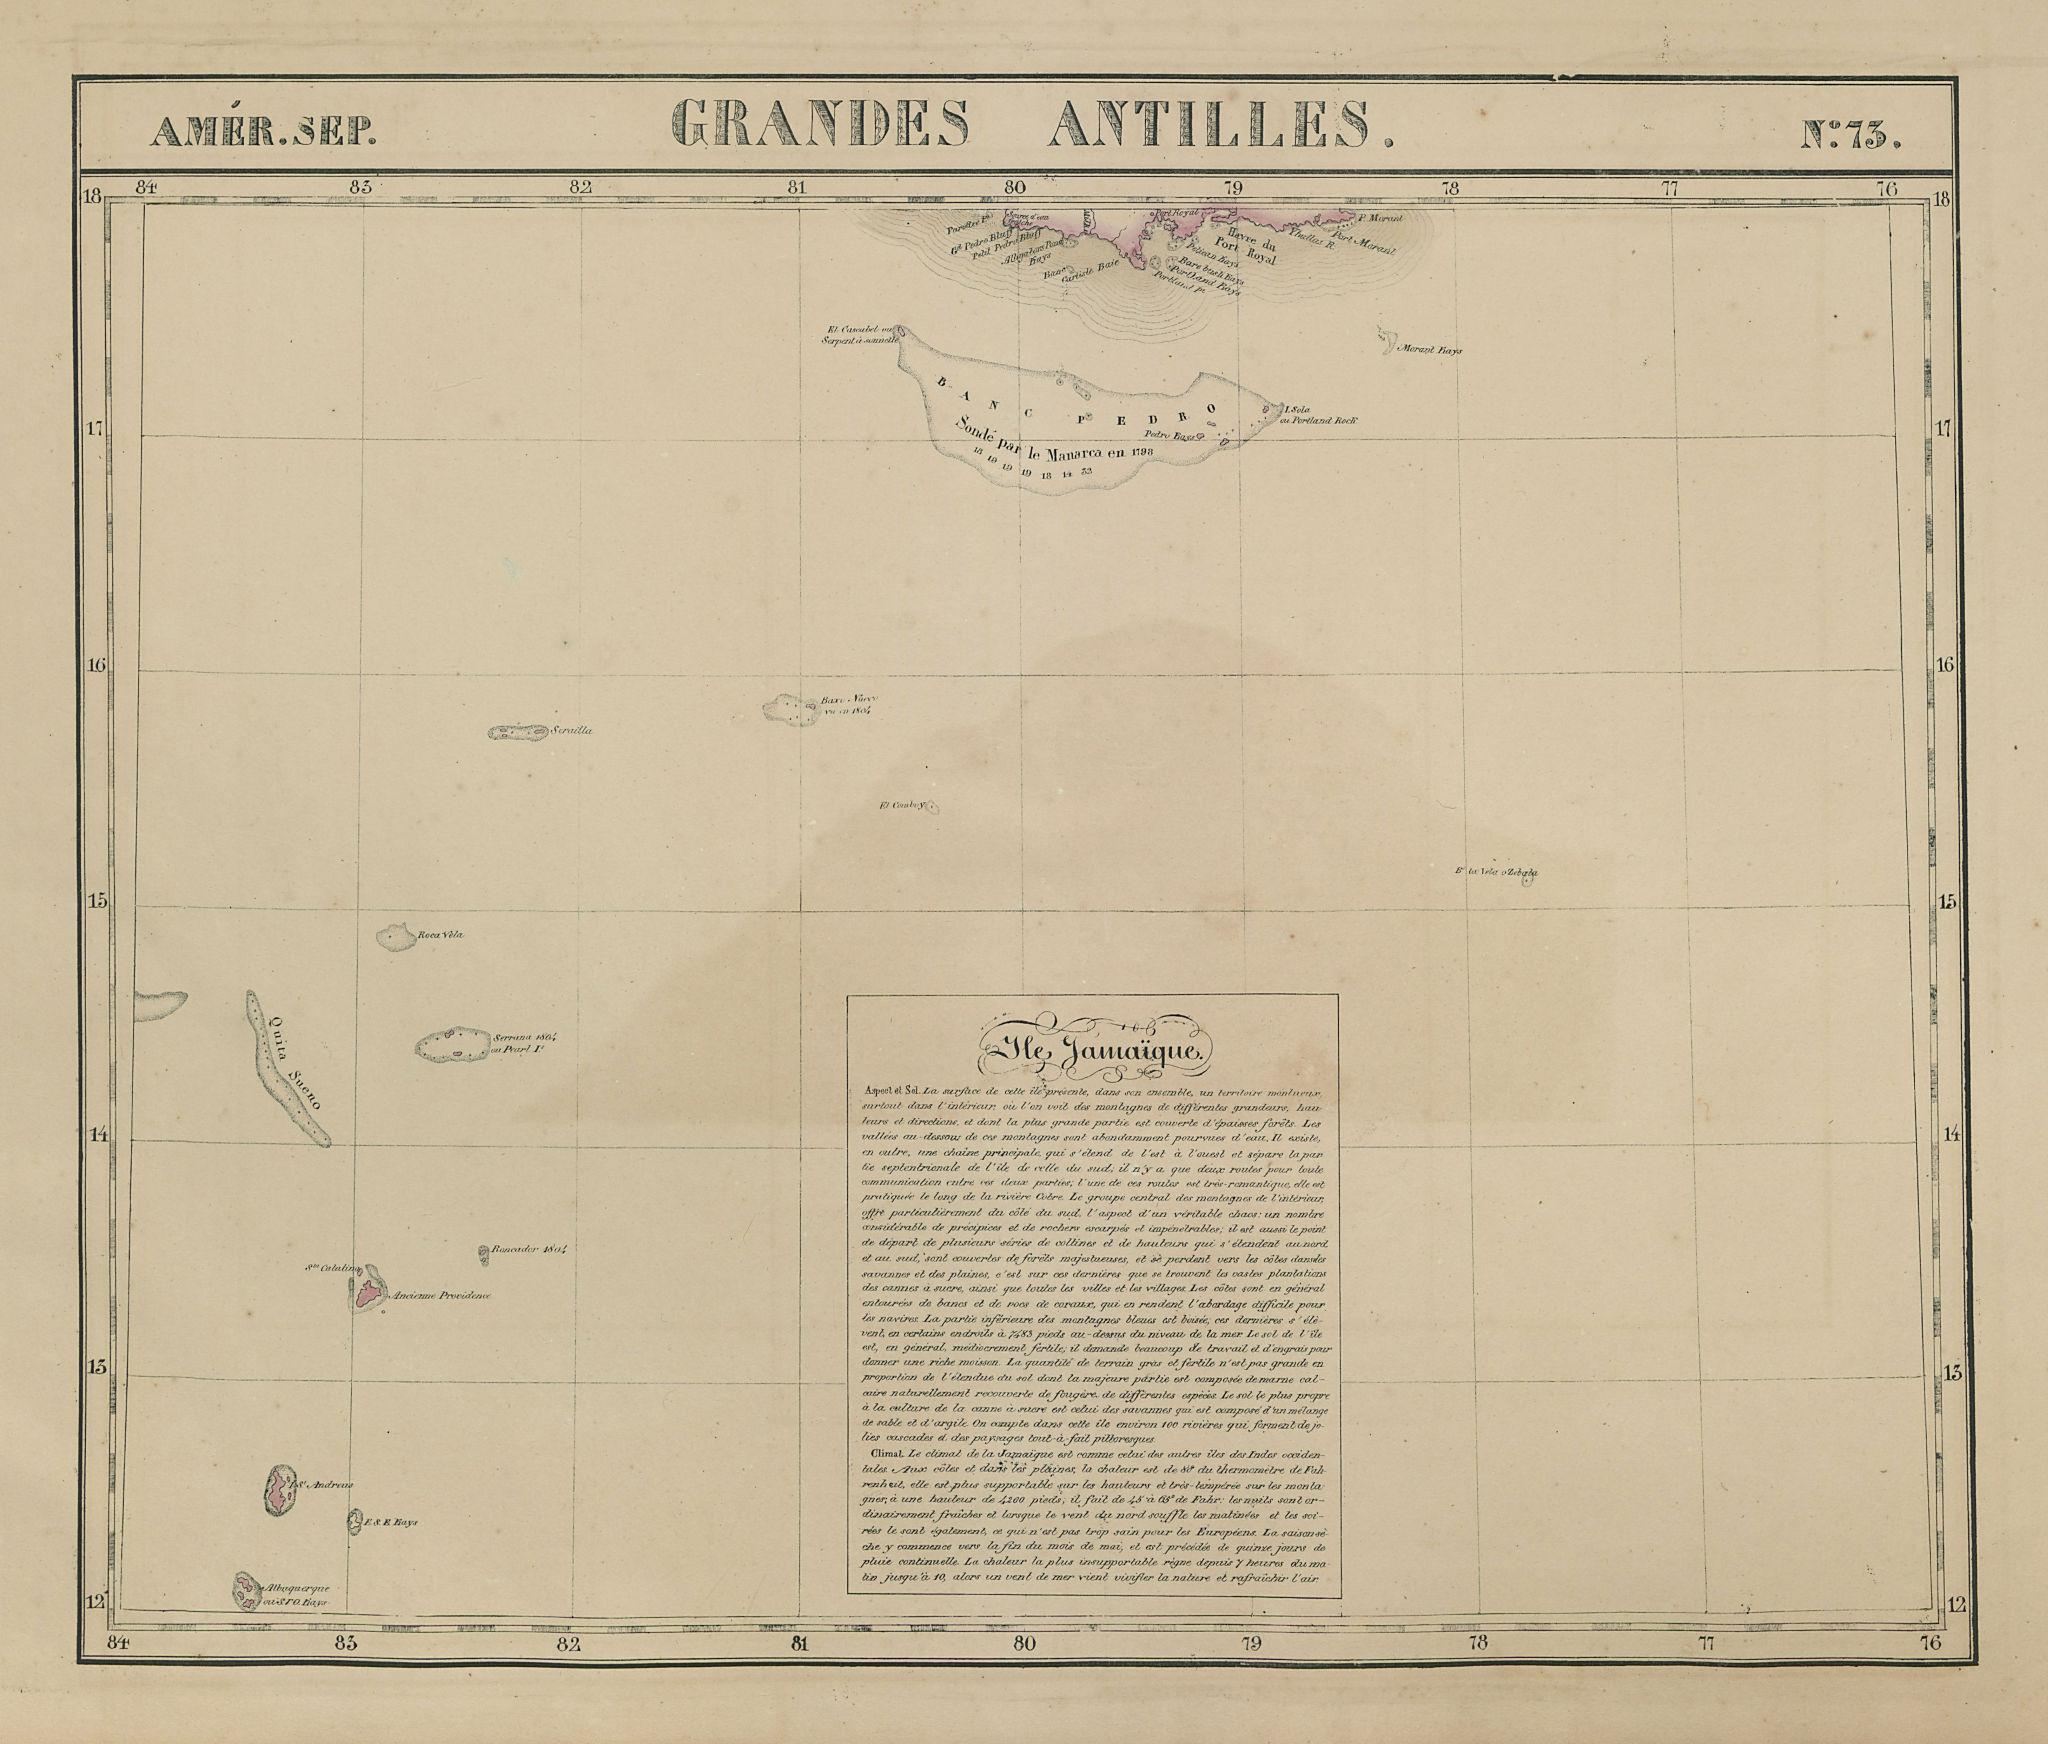 Amér Sep Grandes Antilles 73 Jamaica Pedro Bank San Andrés VANDERMAELEN 1827 map